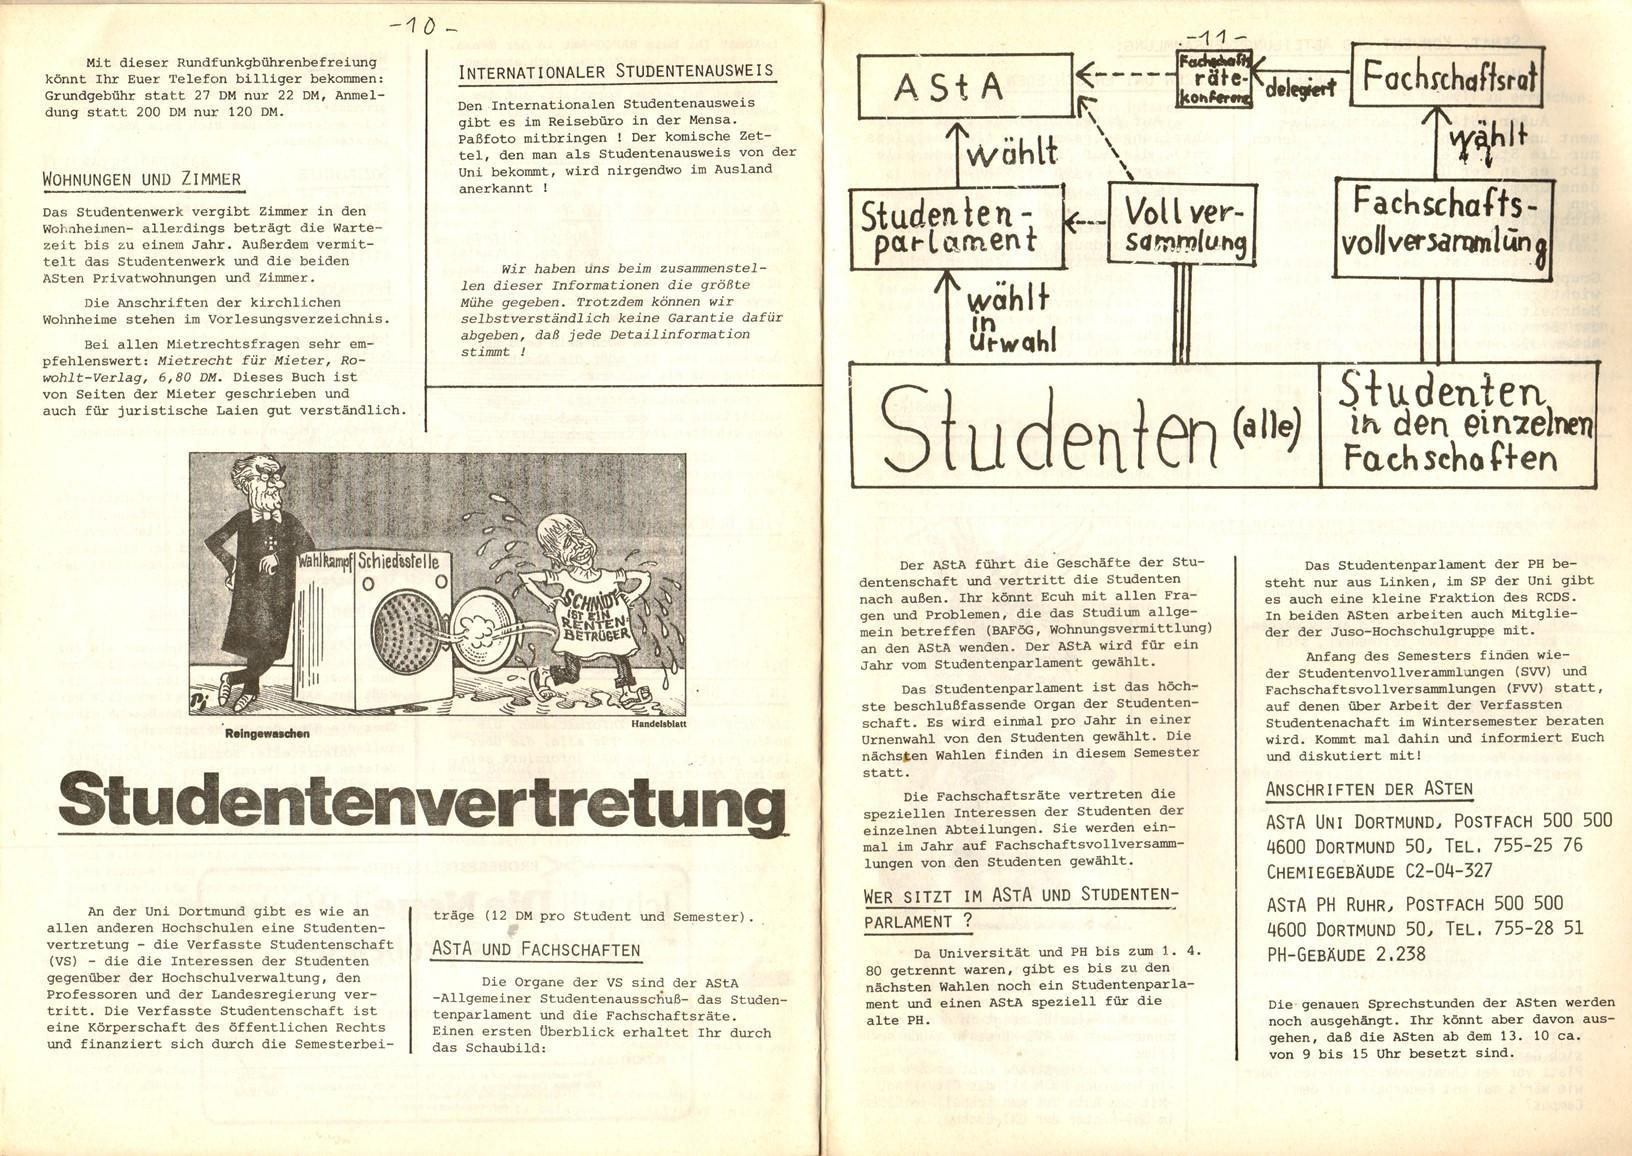 Dortmund_JUSO_HSG_1980_001_06